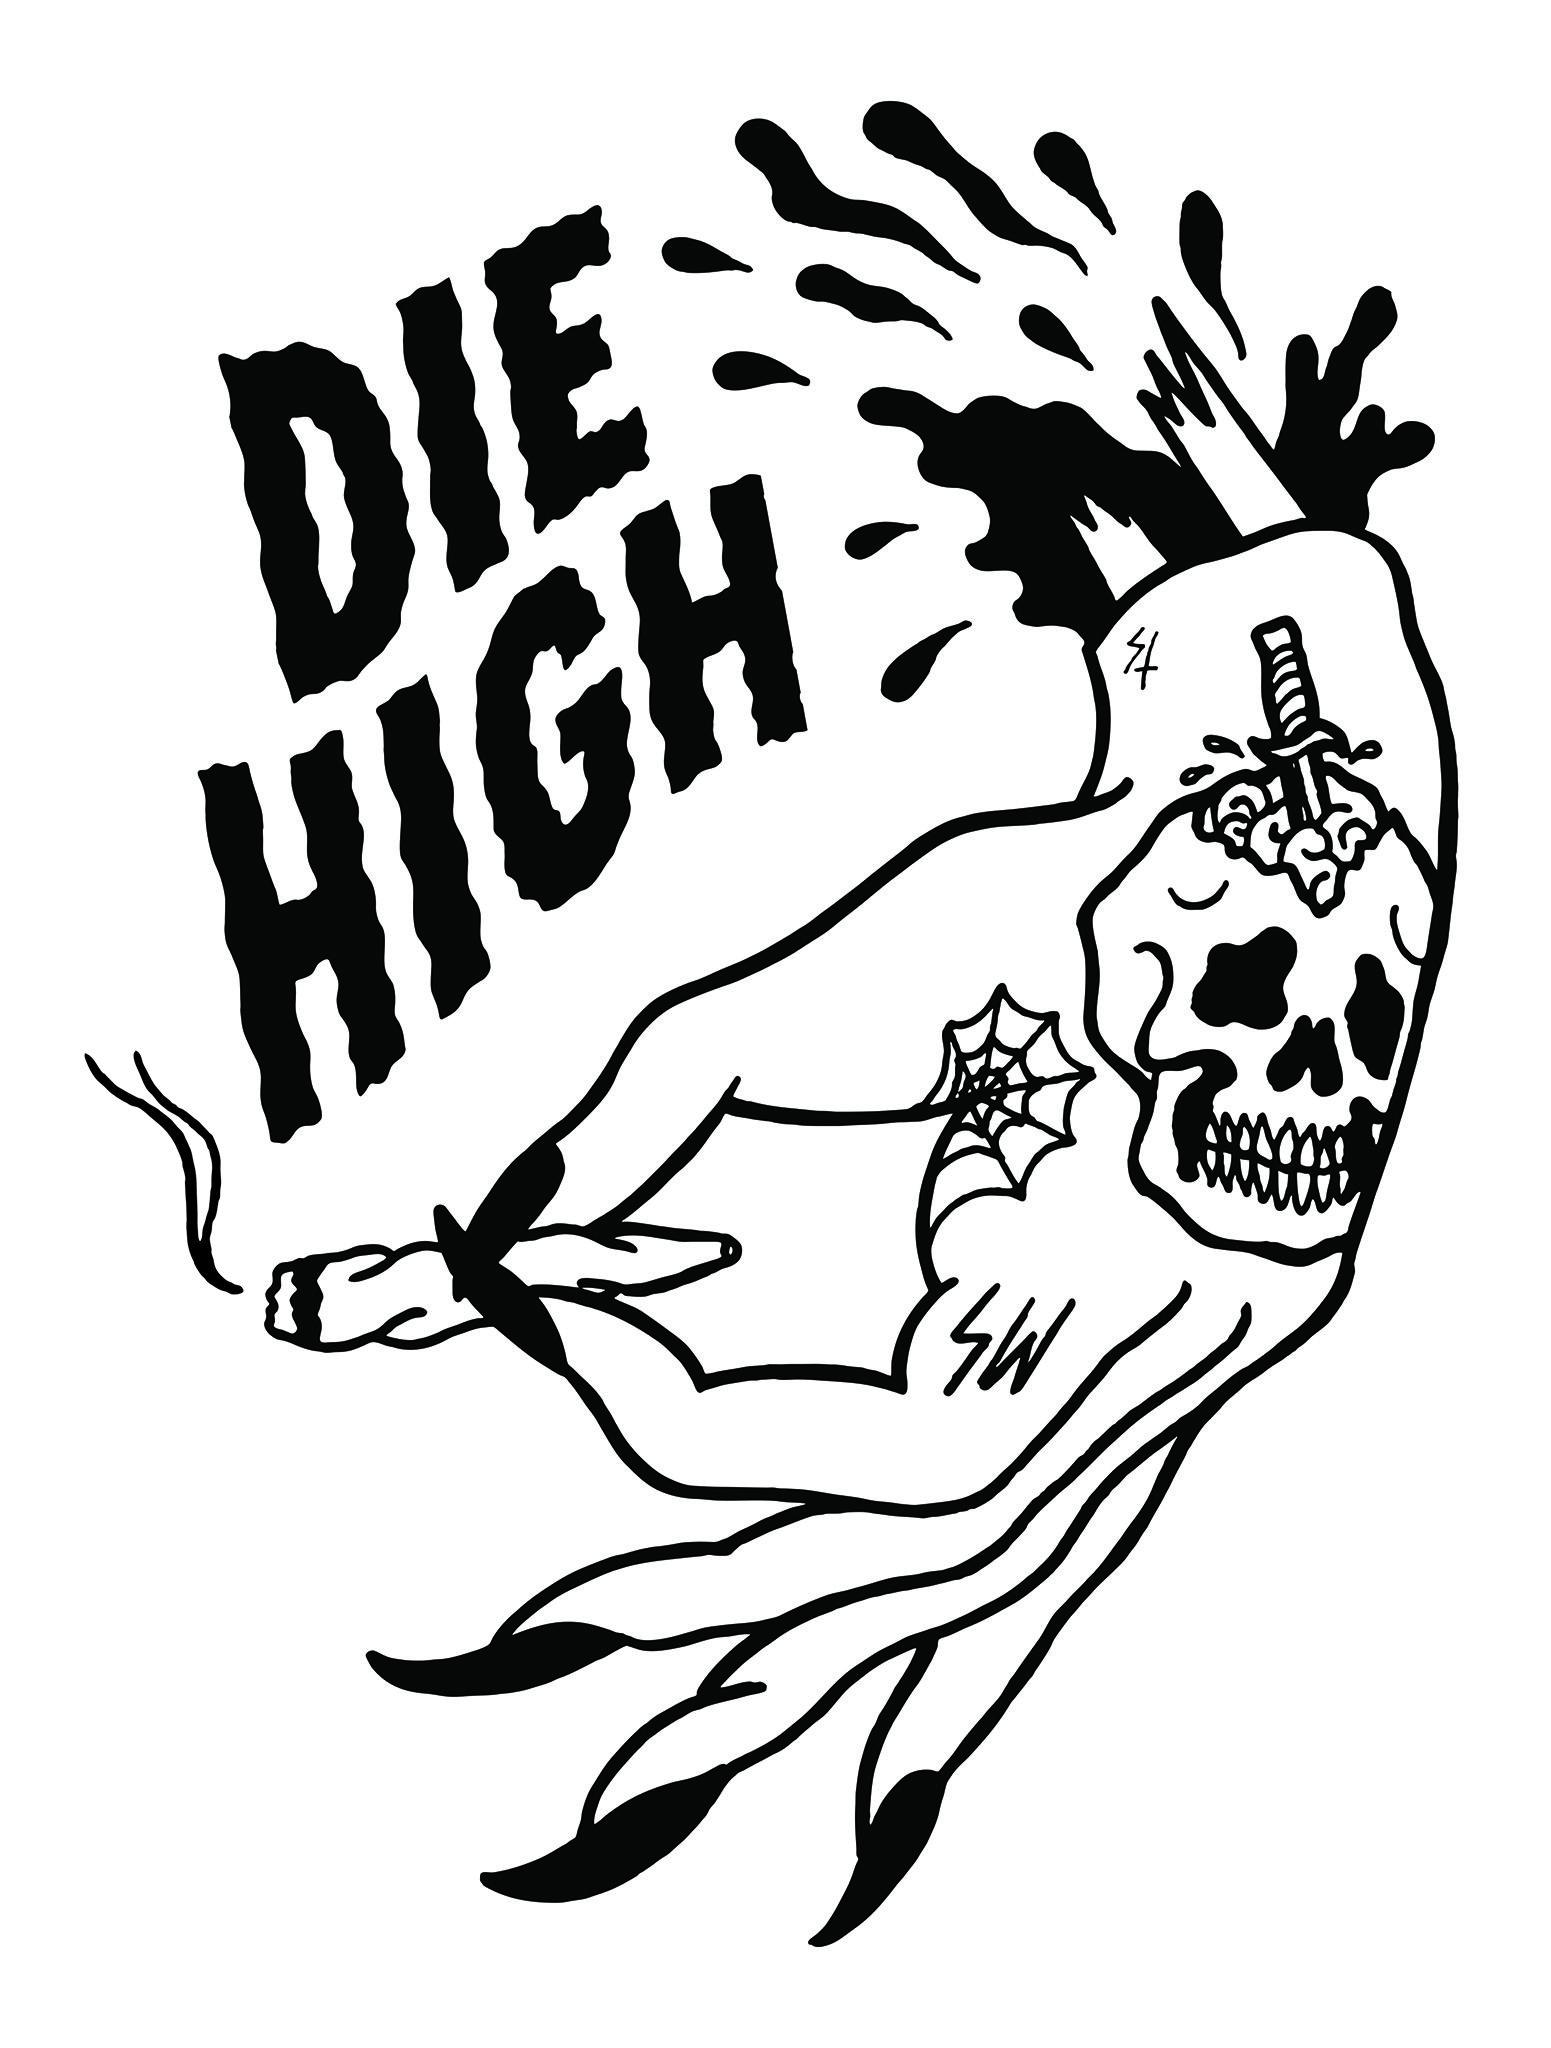 Die High Sketchytank Tattoo Pinterest Tatuajes Ideas De